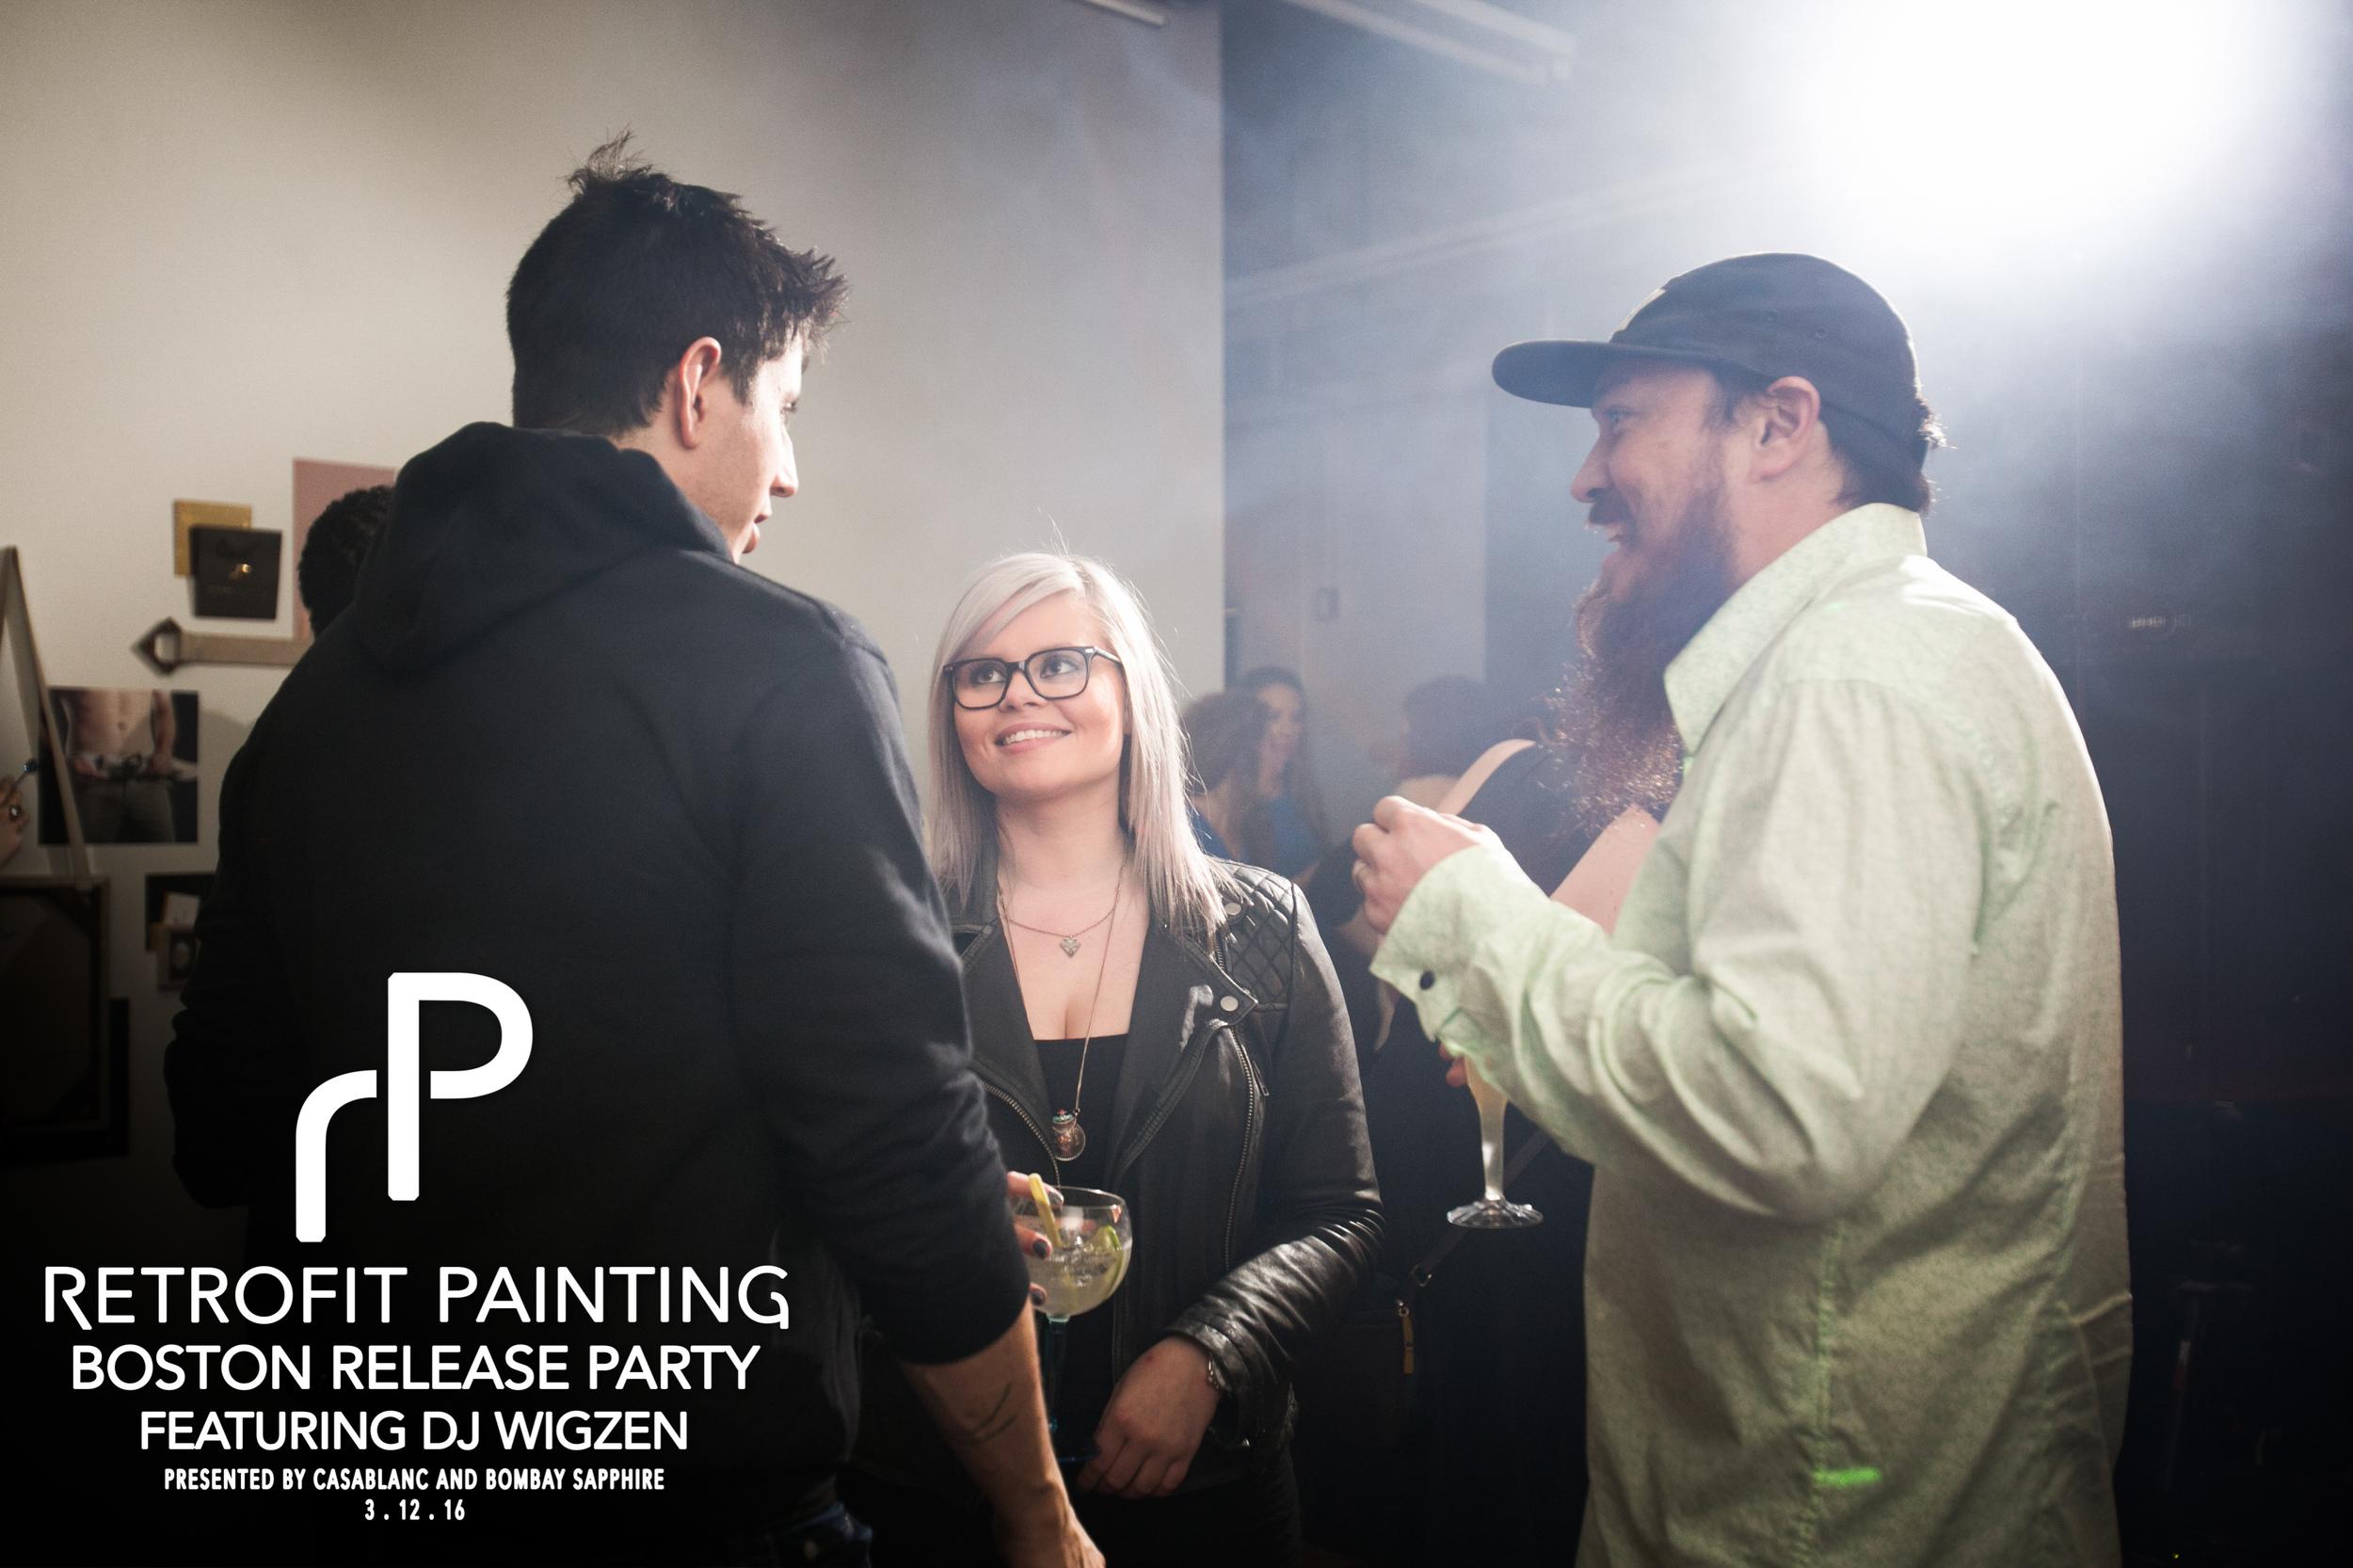 Retrofit Painting Boston Release Party 0173.jpg